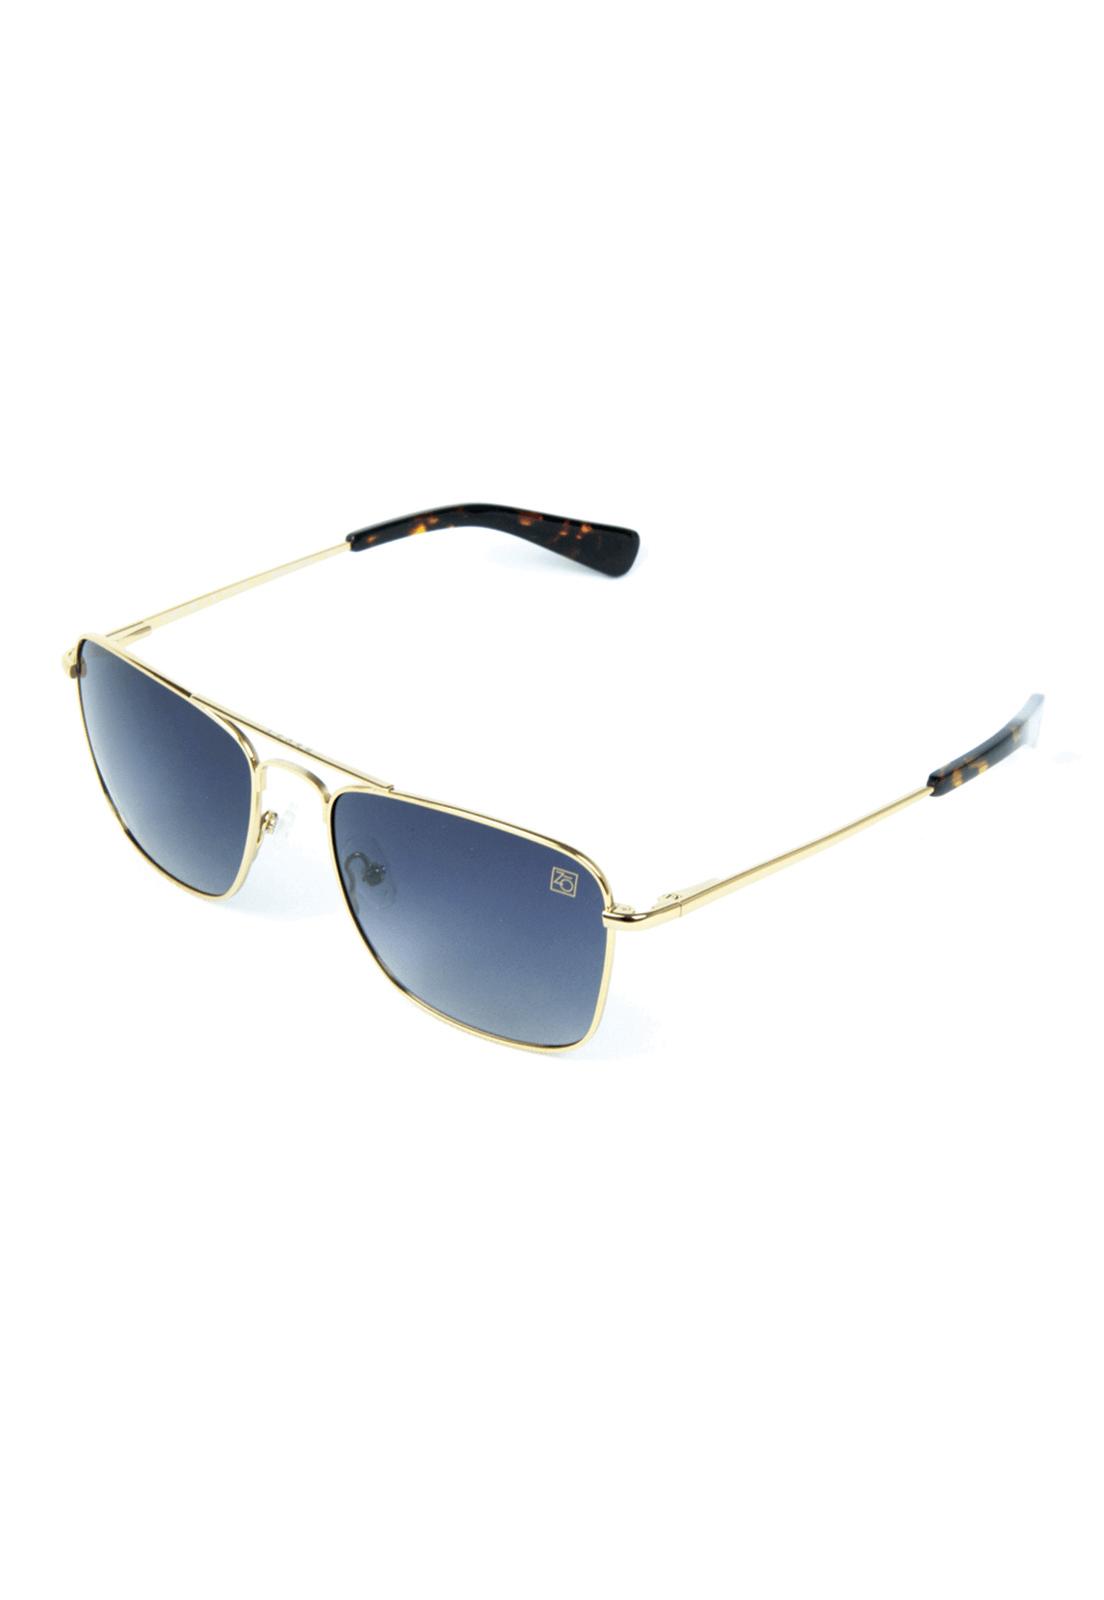 797f17549 Óculos de Sol Polarizado Banhado a Ouro Zabô Lensk lente Black